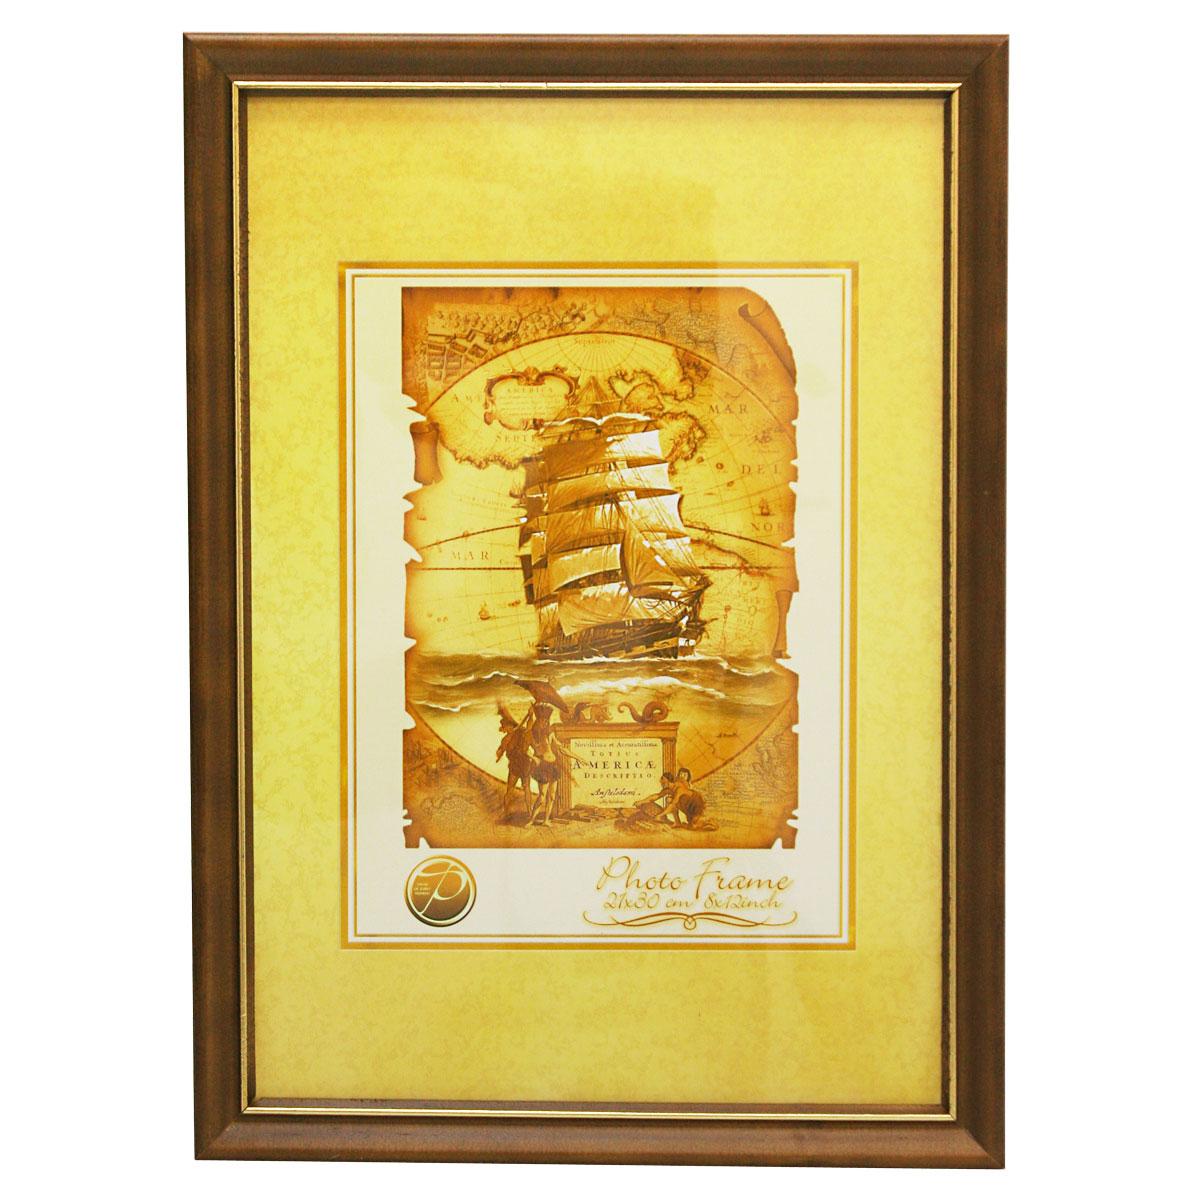 Фоторамка Pioneer Nancy, цвет: темно-коричневый, золотистый, 21 х 30 см фоторамка pioneer viola 21 х 30 см